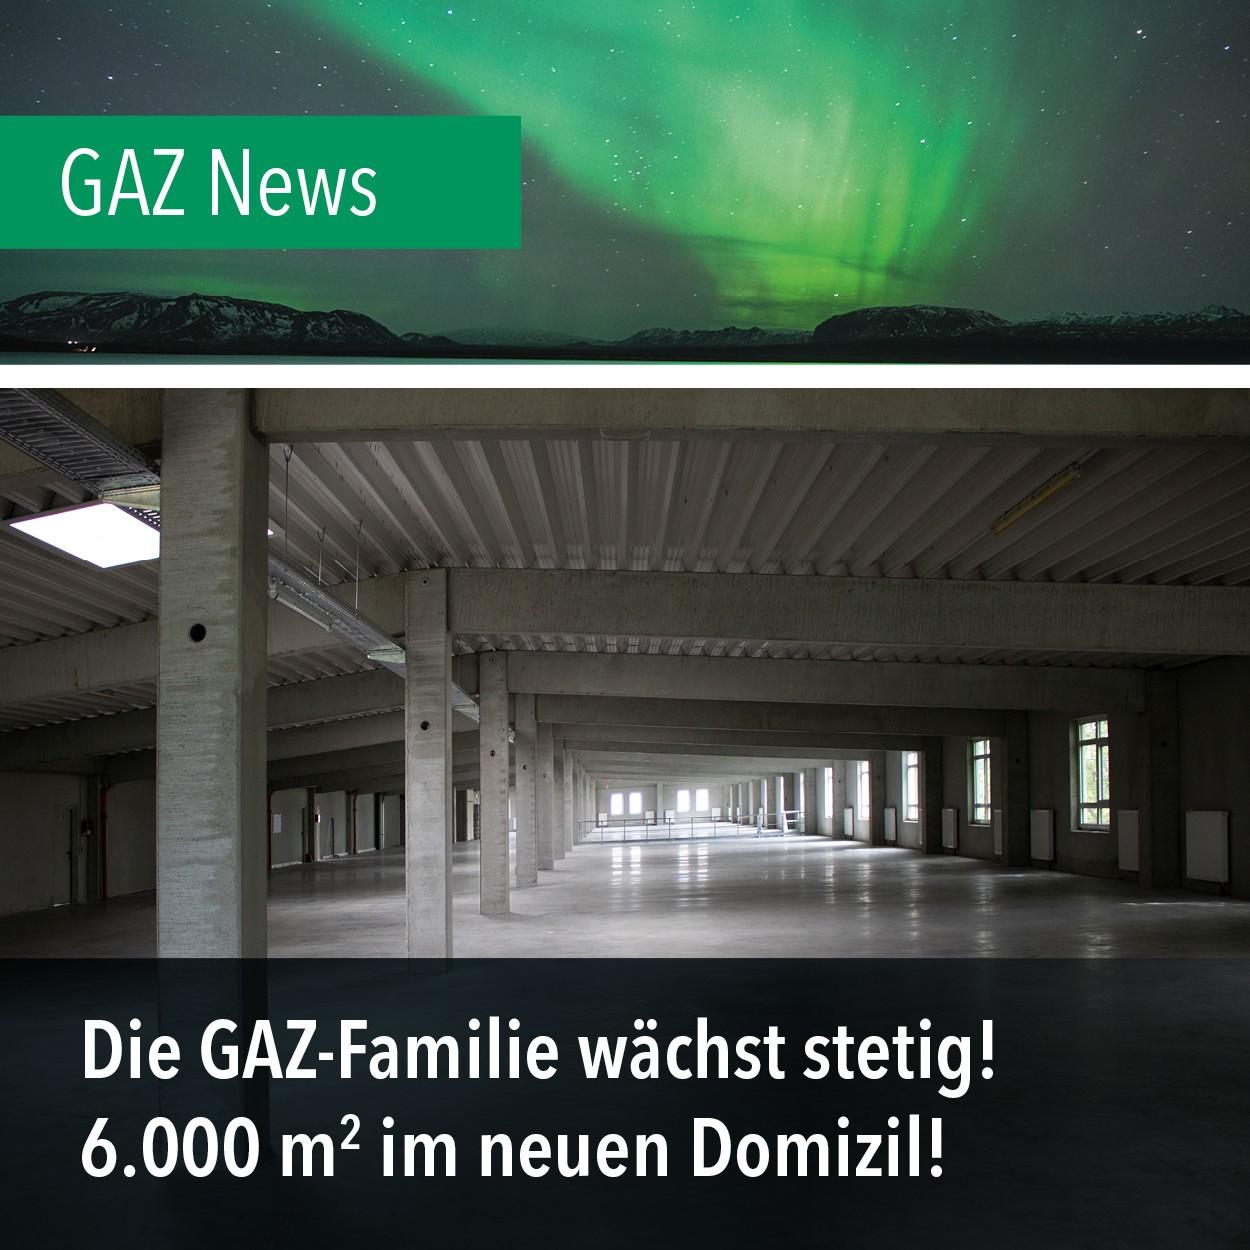 die_gaz_zieht_um_600x600px